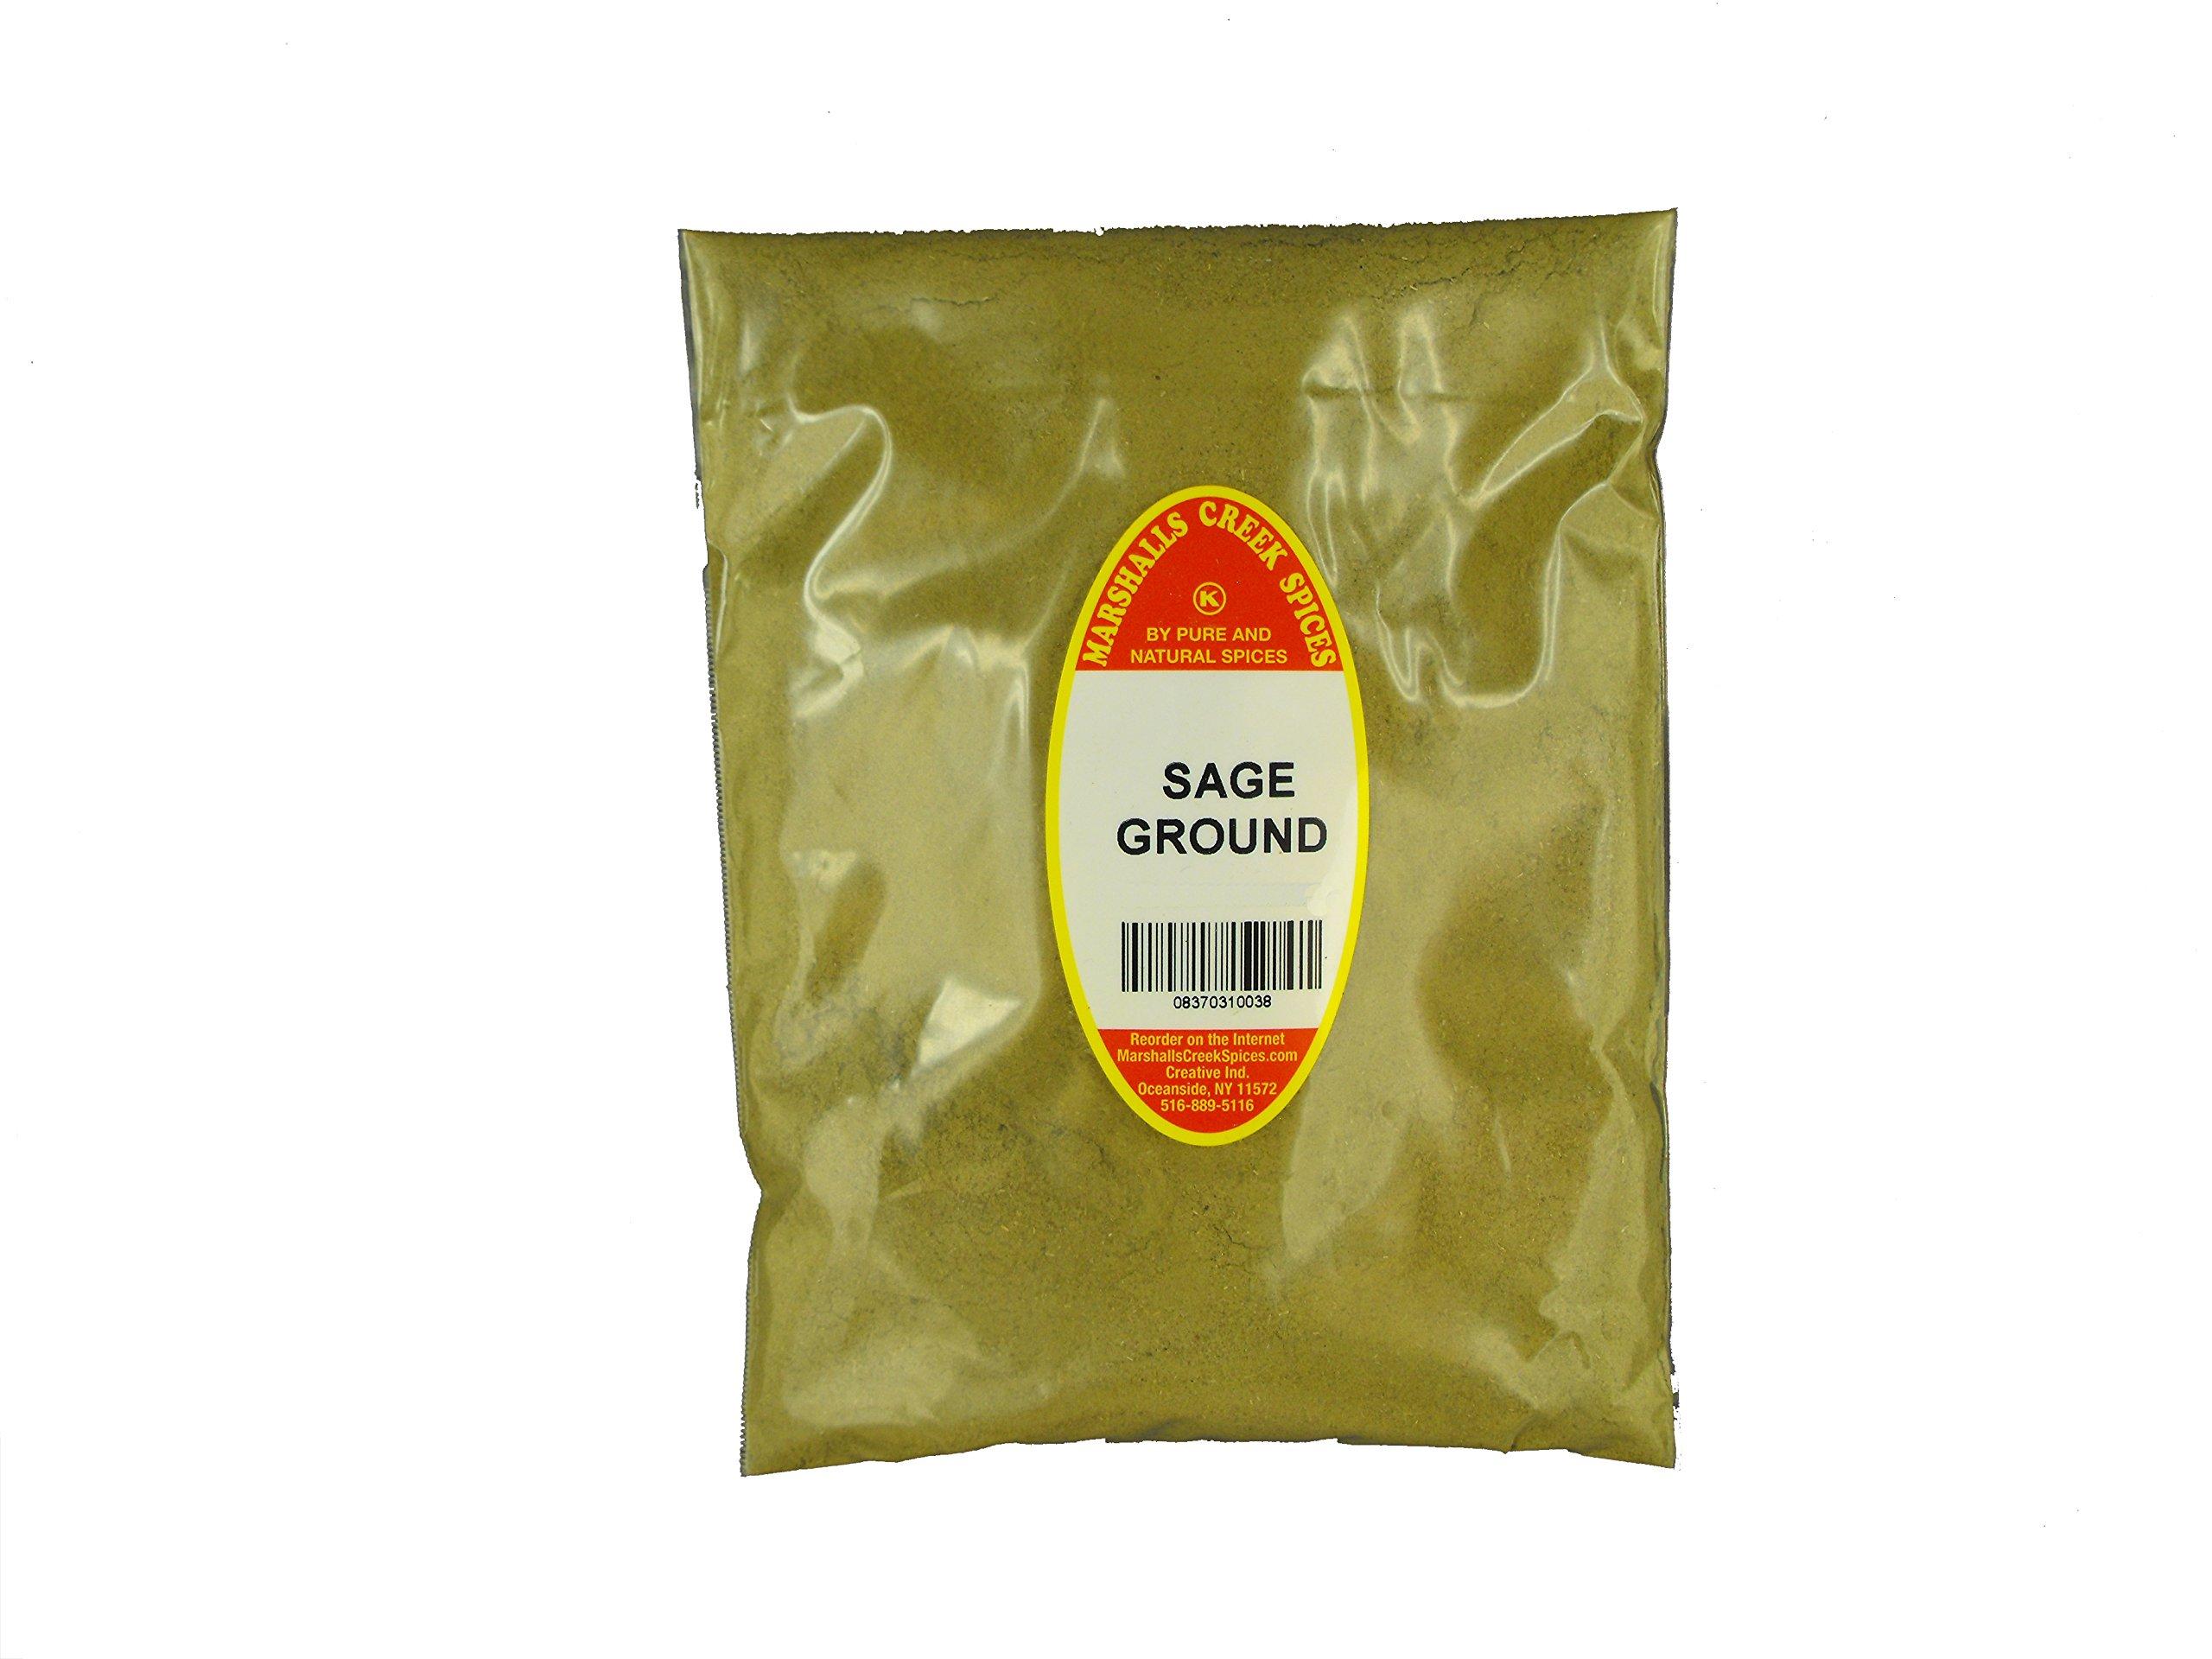 Marshalls Creek Kosher Spices (12 pack) SAGE GROUND REFILL,  7 oz.